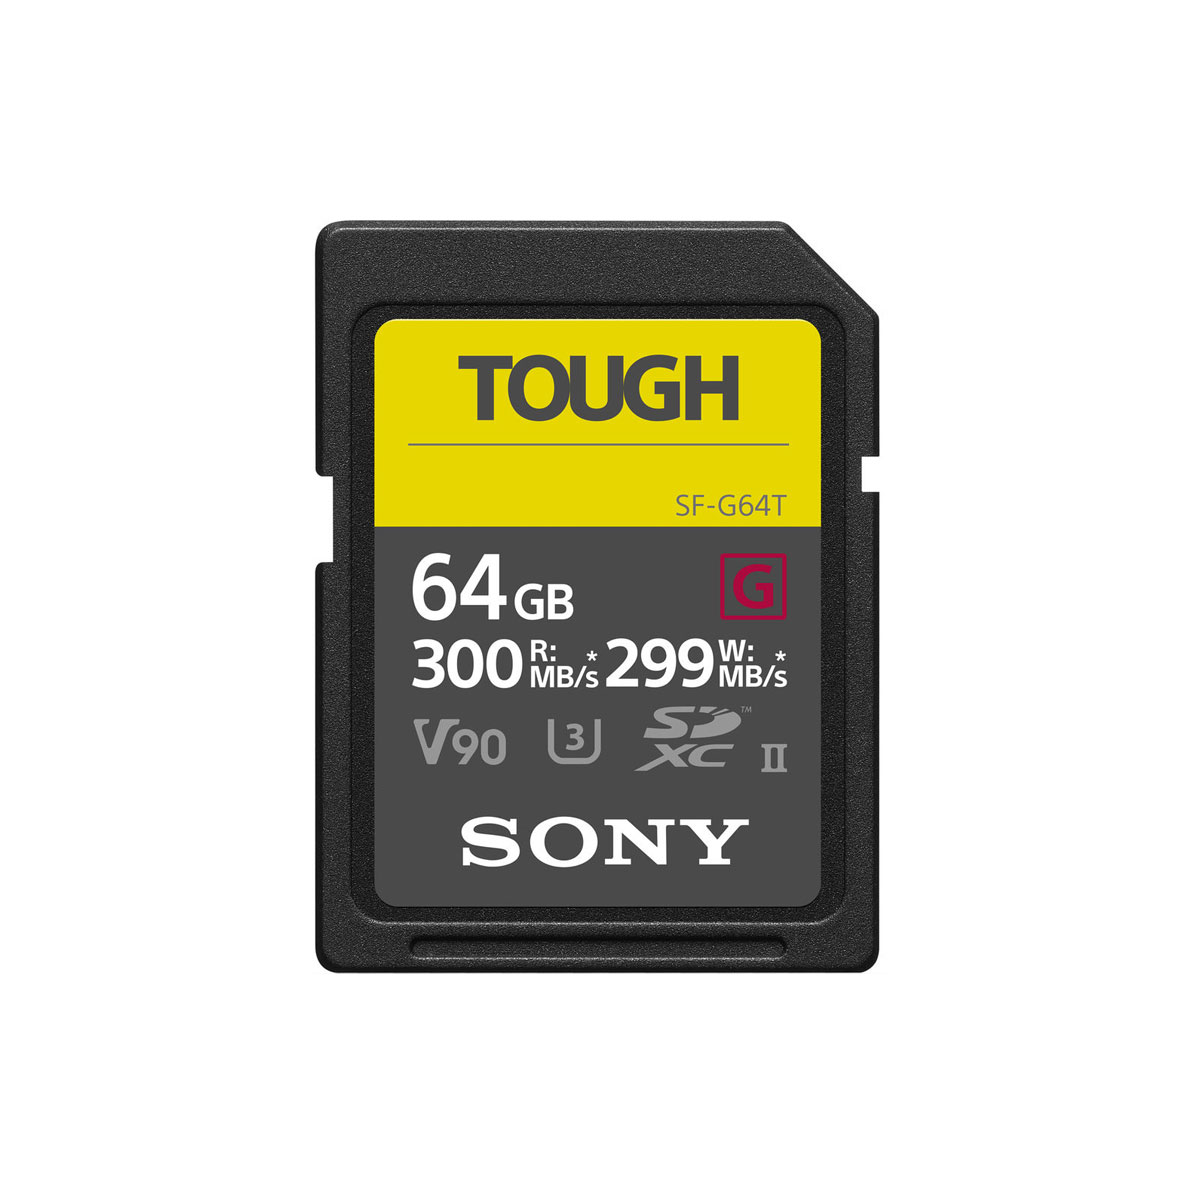 SONY Pro Tough SD 64GB 18x stronger UHS-II R300 W299 V90